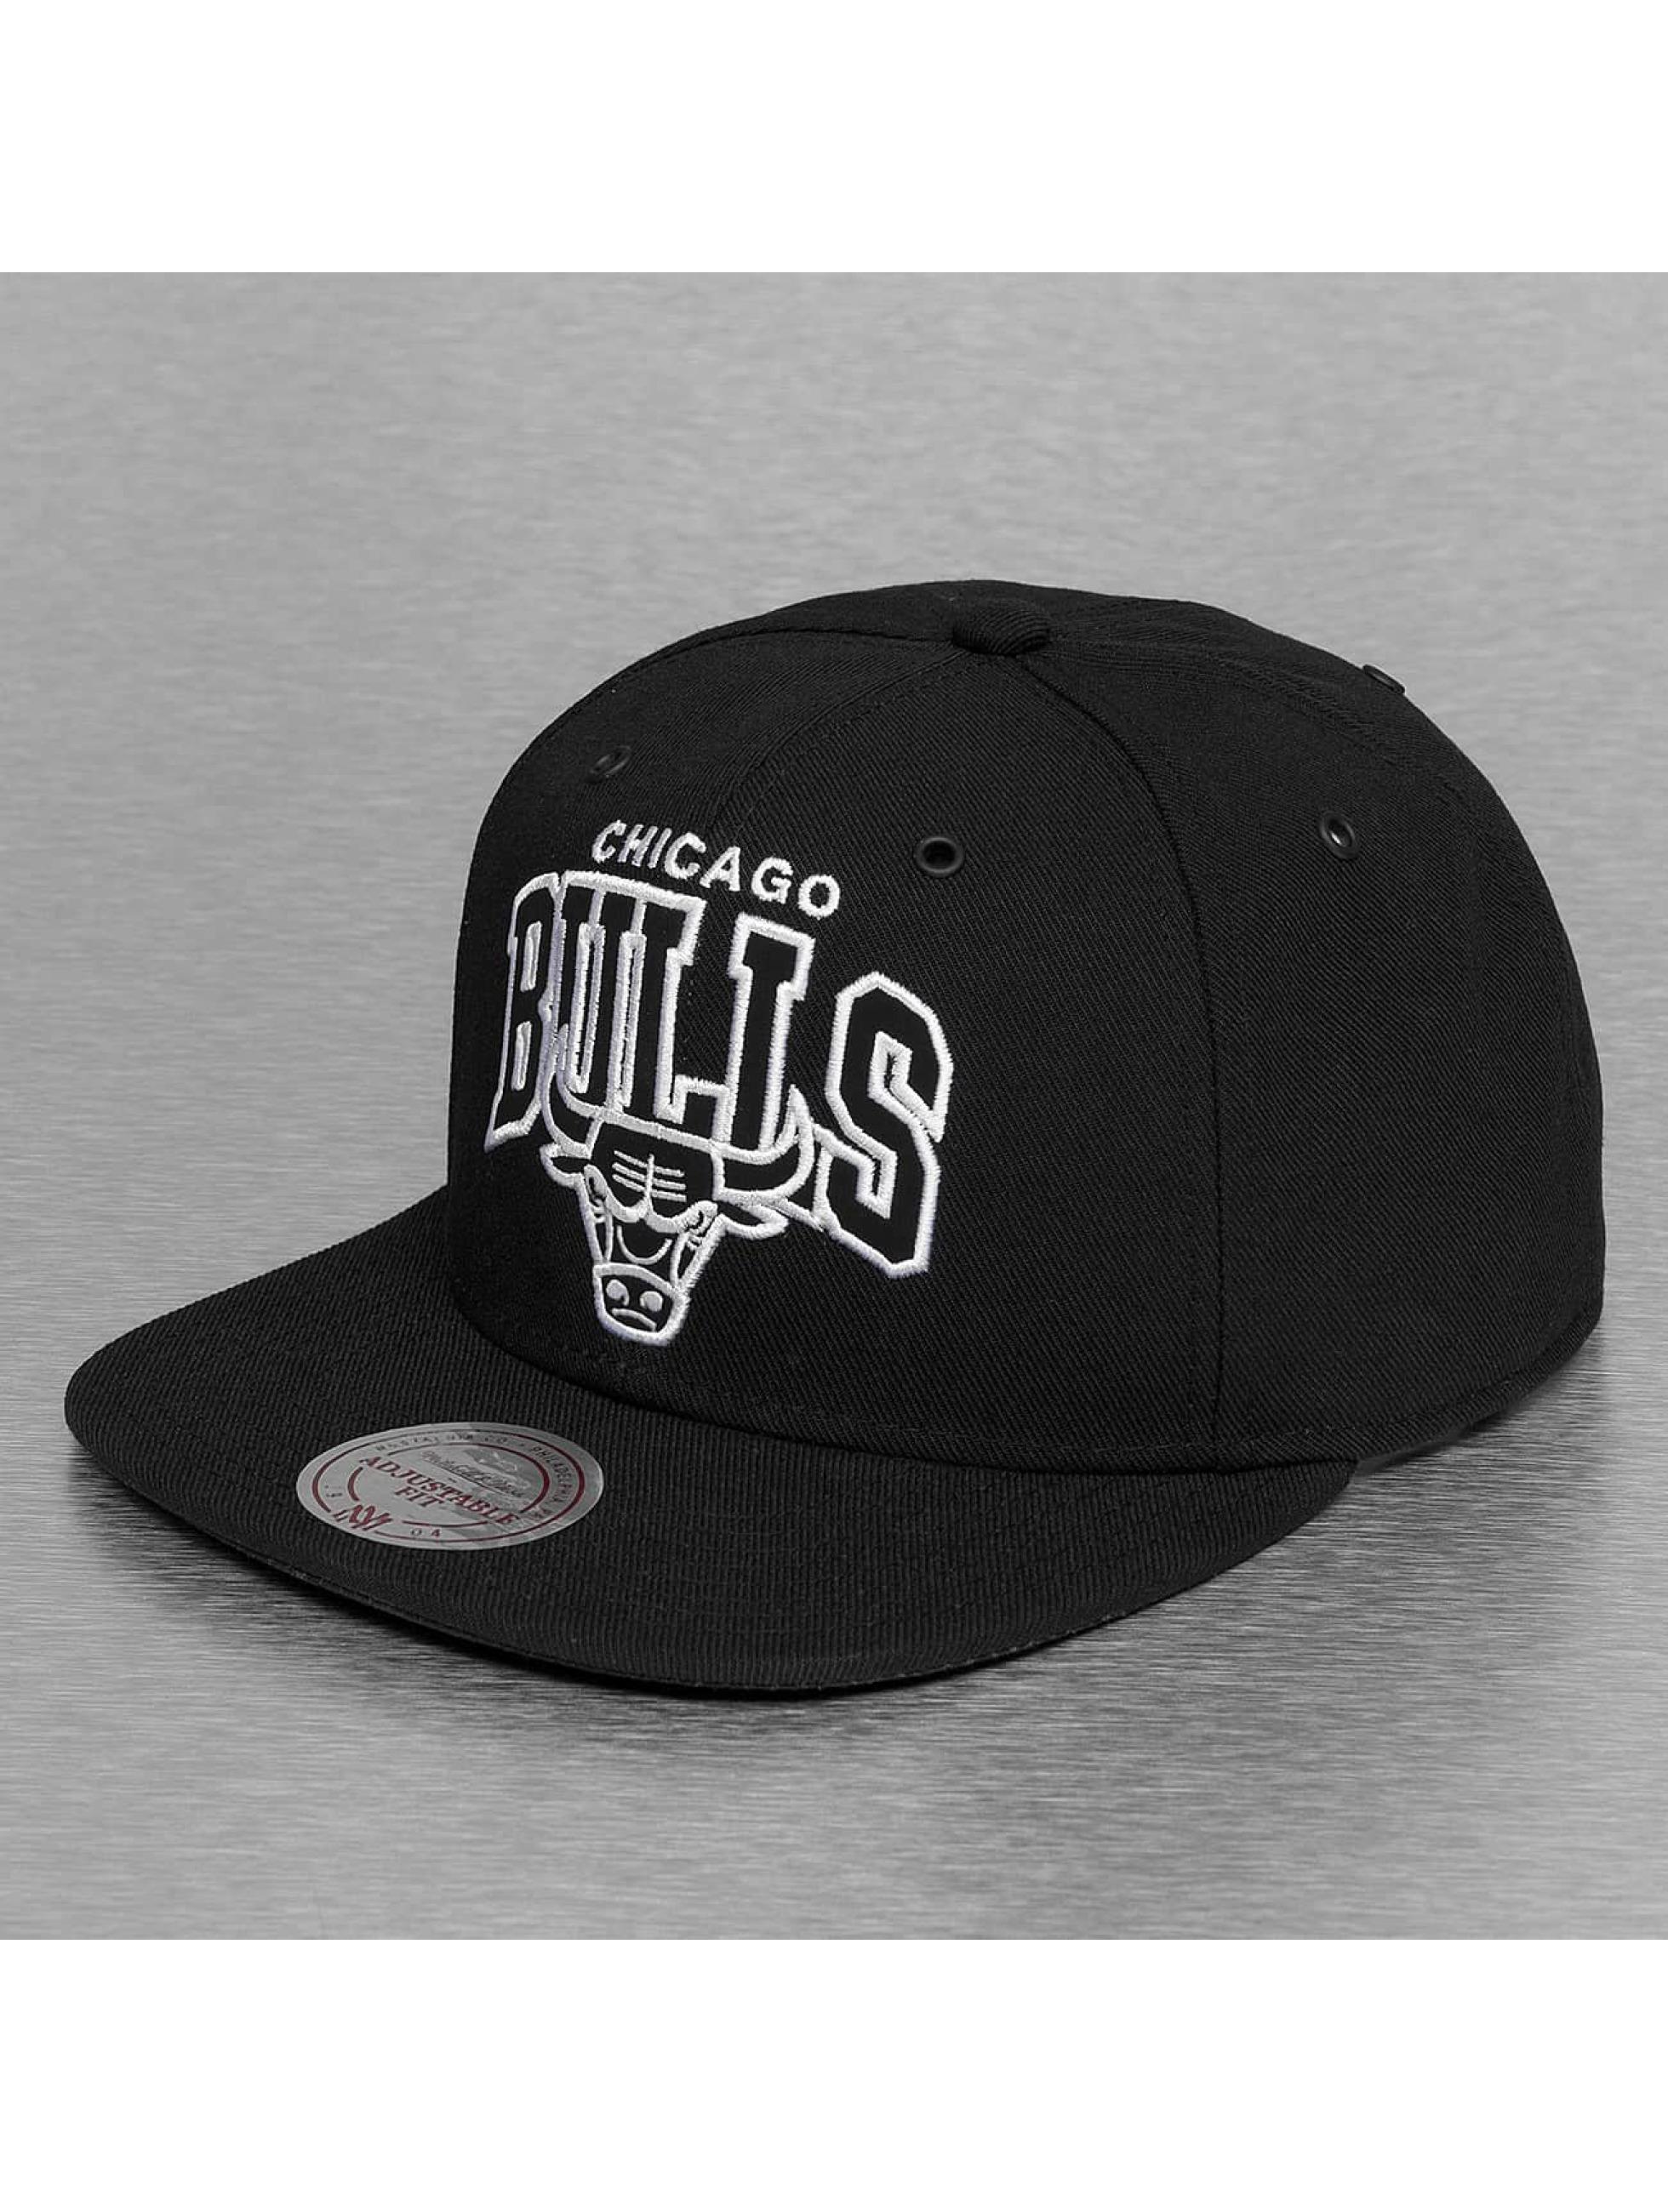 Mitchell & Ness Snapback Cap Black and White Arch Chicago Bulls black